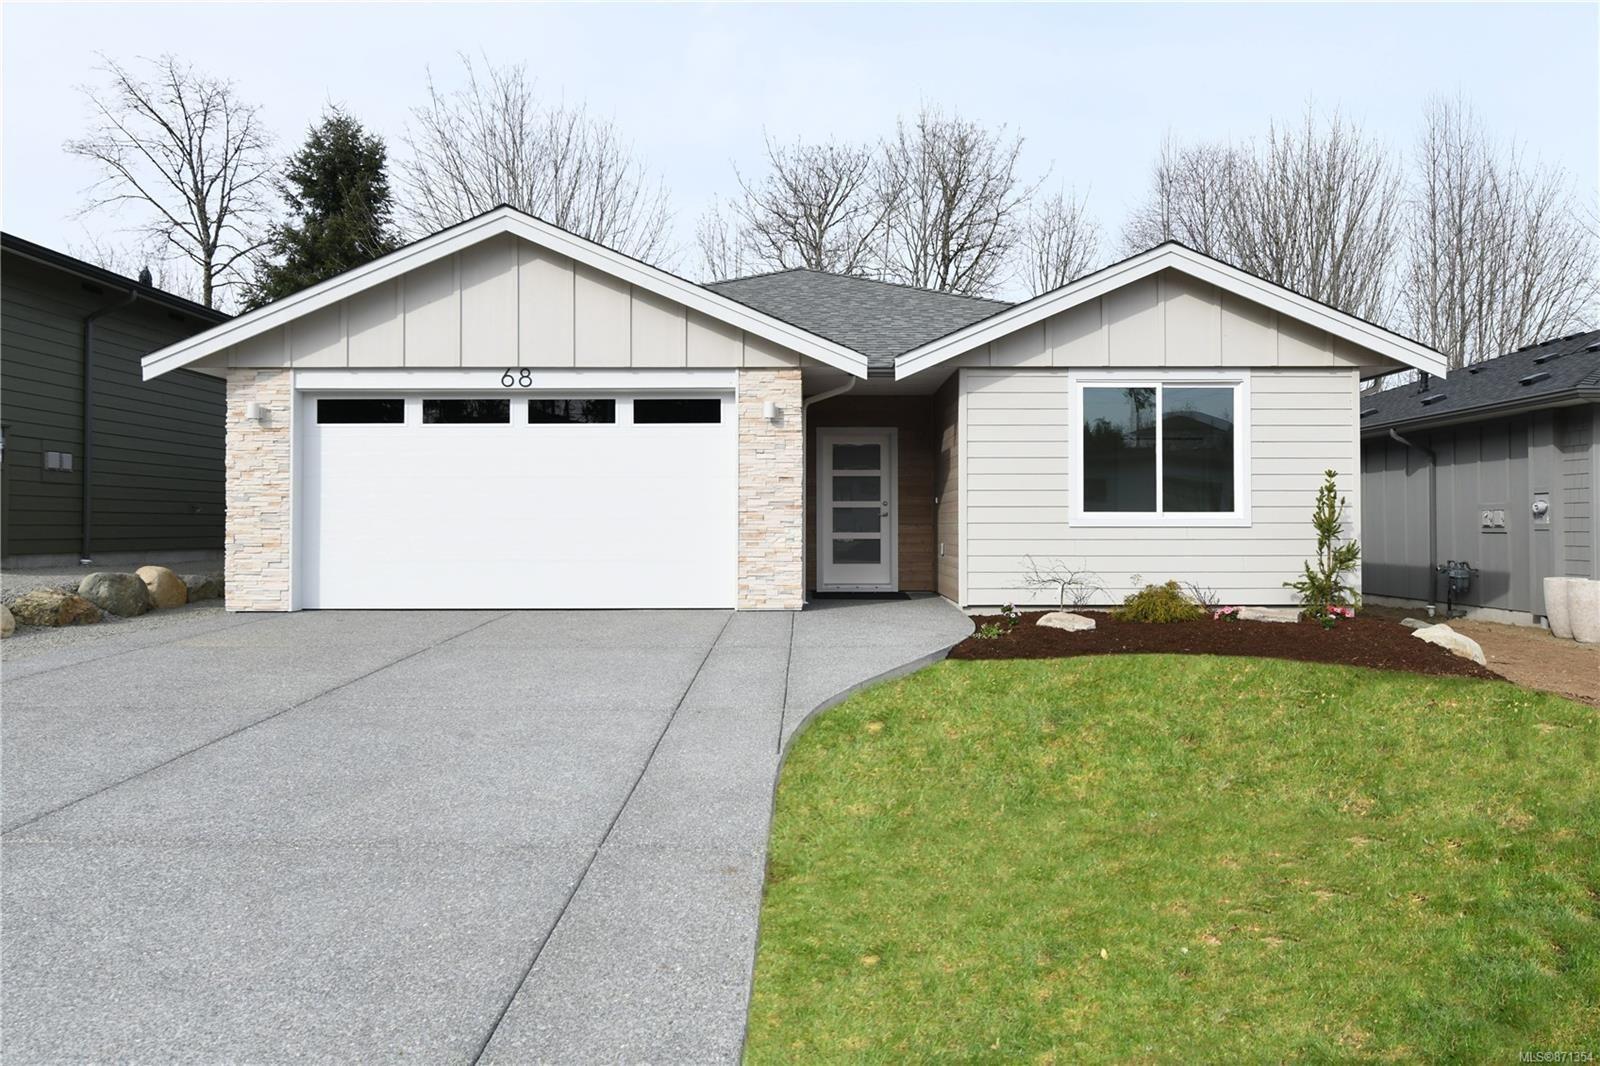 Main Photo: 68 Grayhawk Pl in : CV Courtenay City House for sale (Comox Valley)  : MLS®# 871354